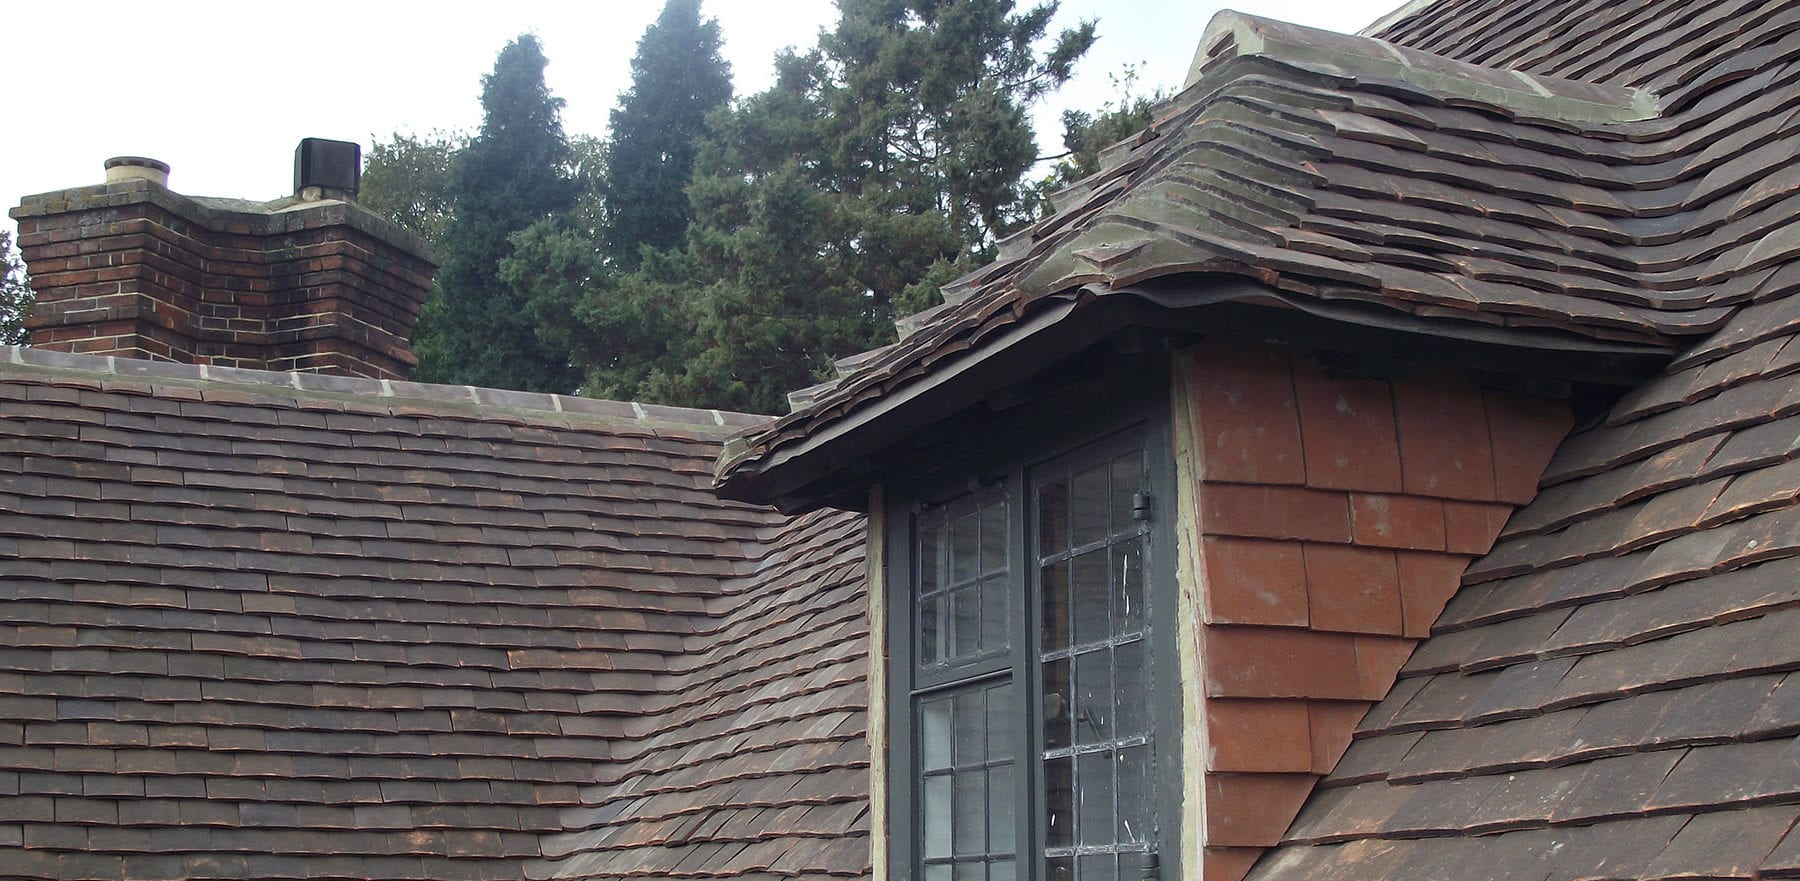 Lifestiles - Handmade Restoration Clay Roof Tiles - Dorking, England 4